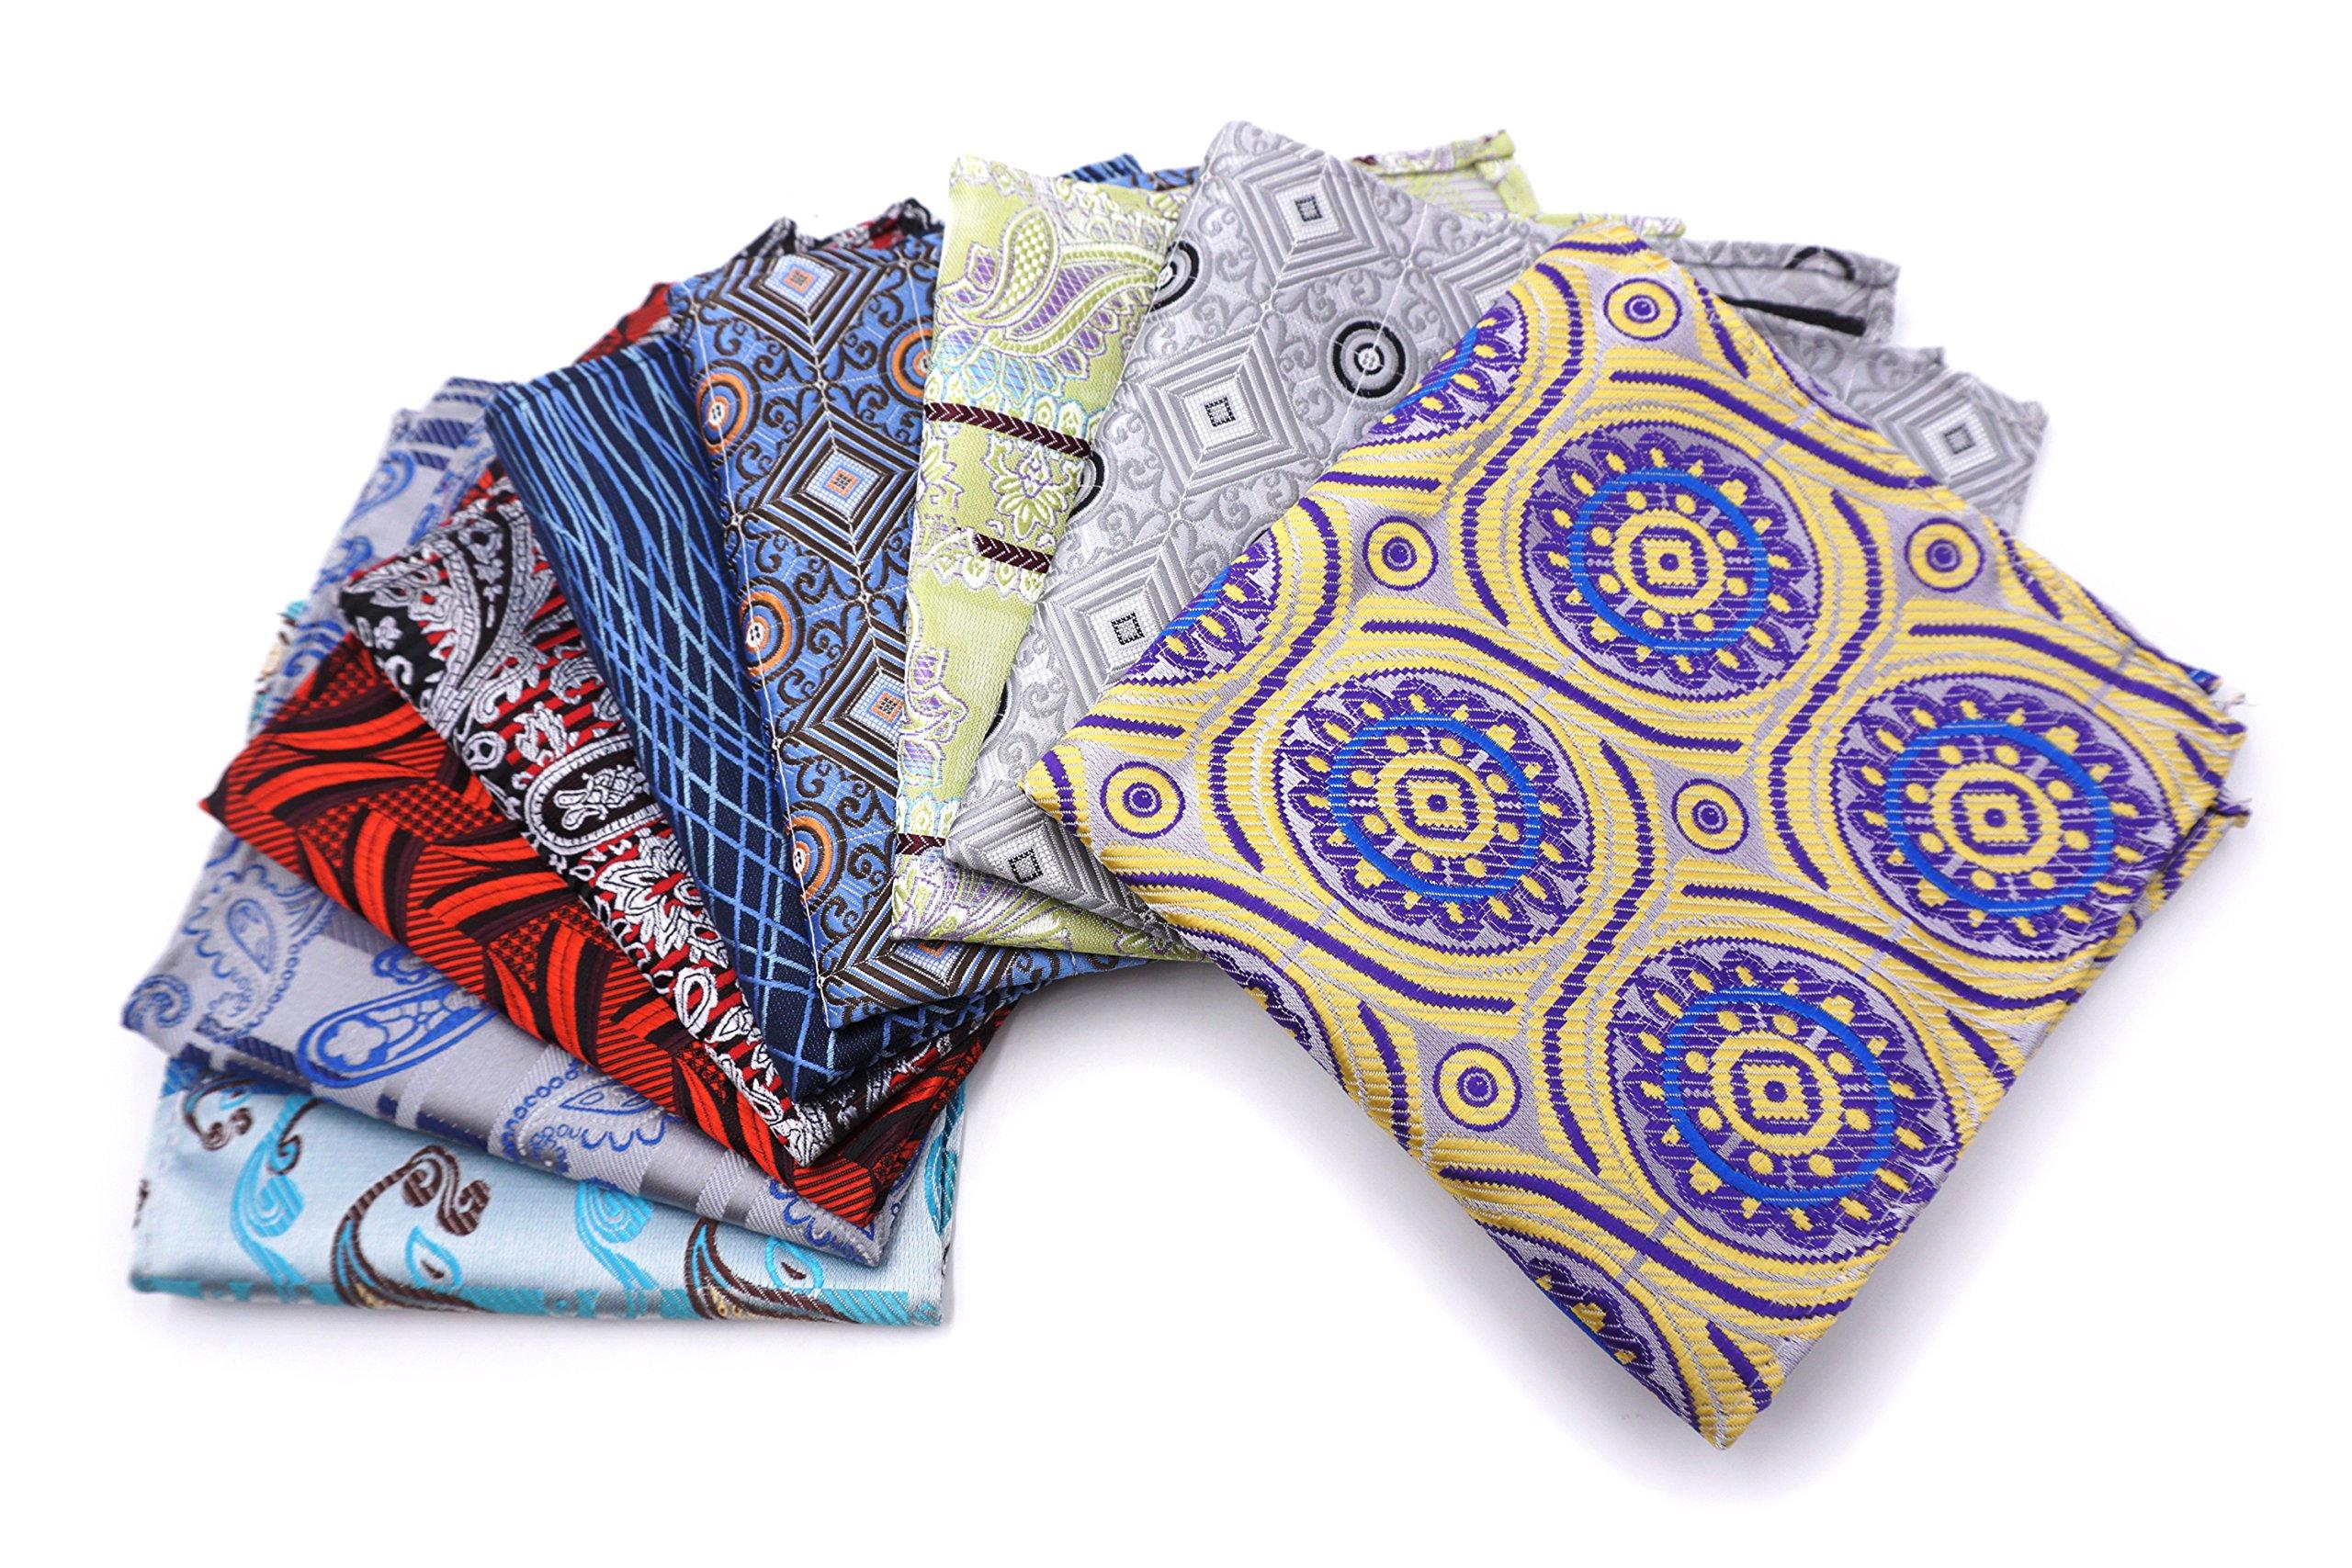 AVANTMEN 10 PCS Men's Pocket Squares Assorted Woven Handkerchief Hanky with Gift Box (10 x 10, S6)